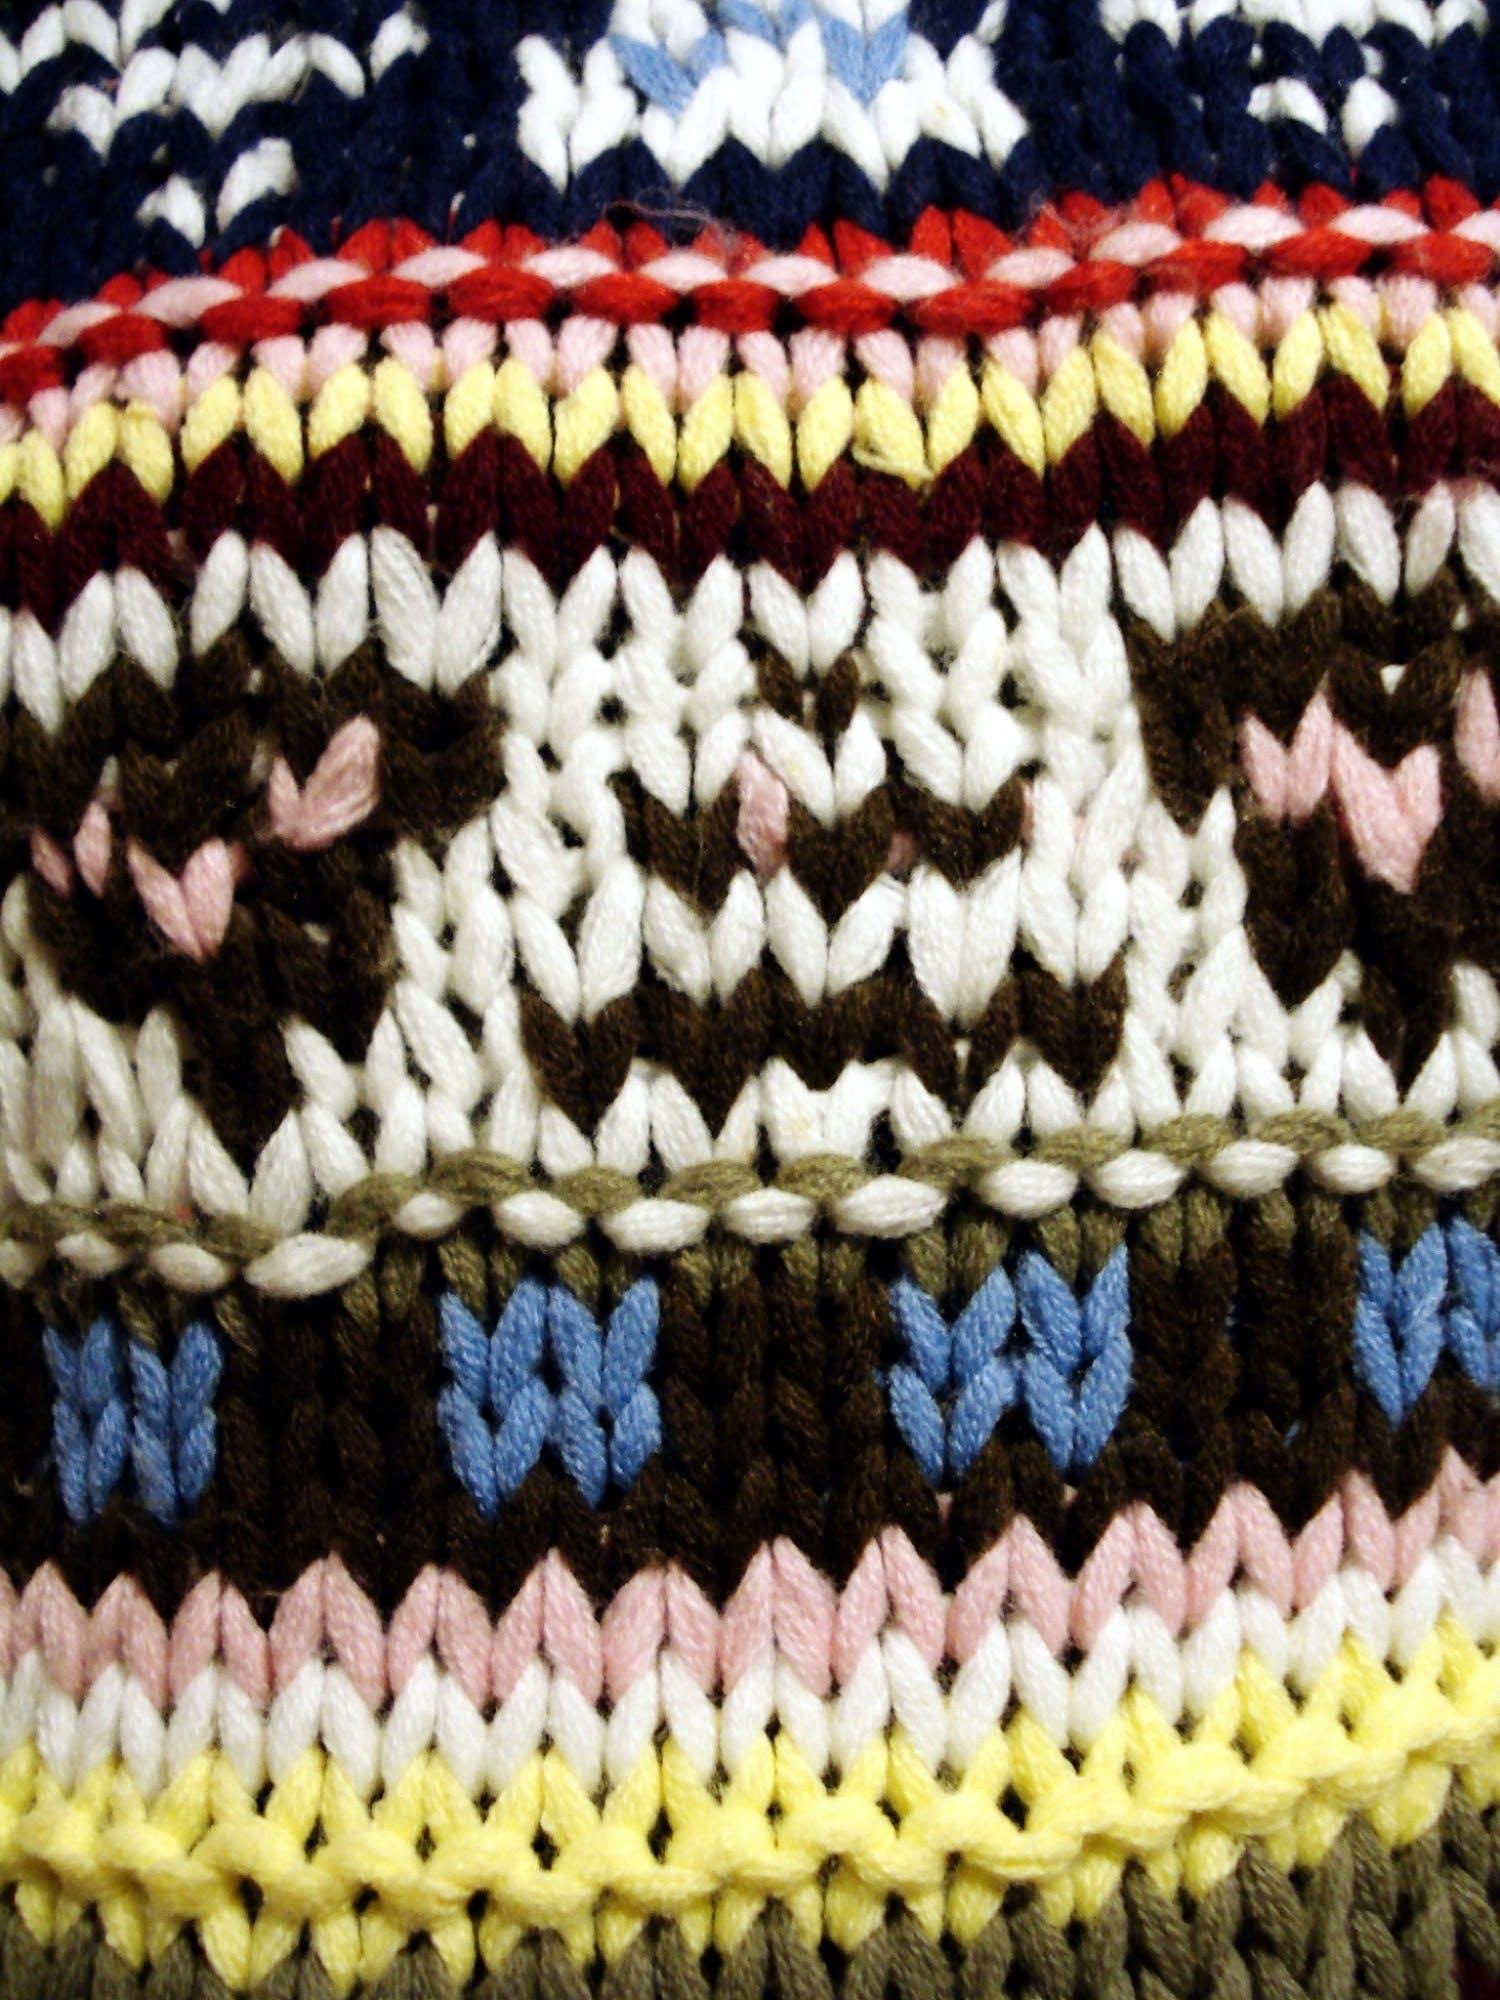 Free stock photo of fabric, wool, detail, theme patterns